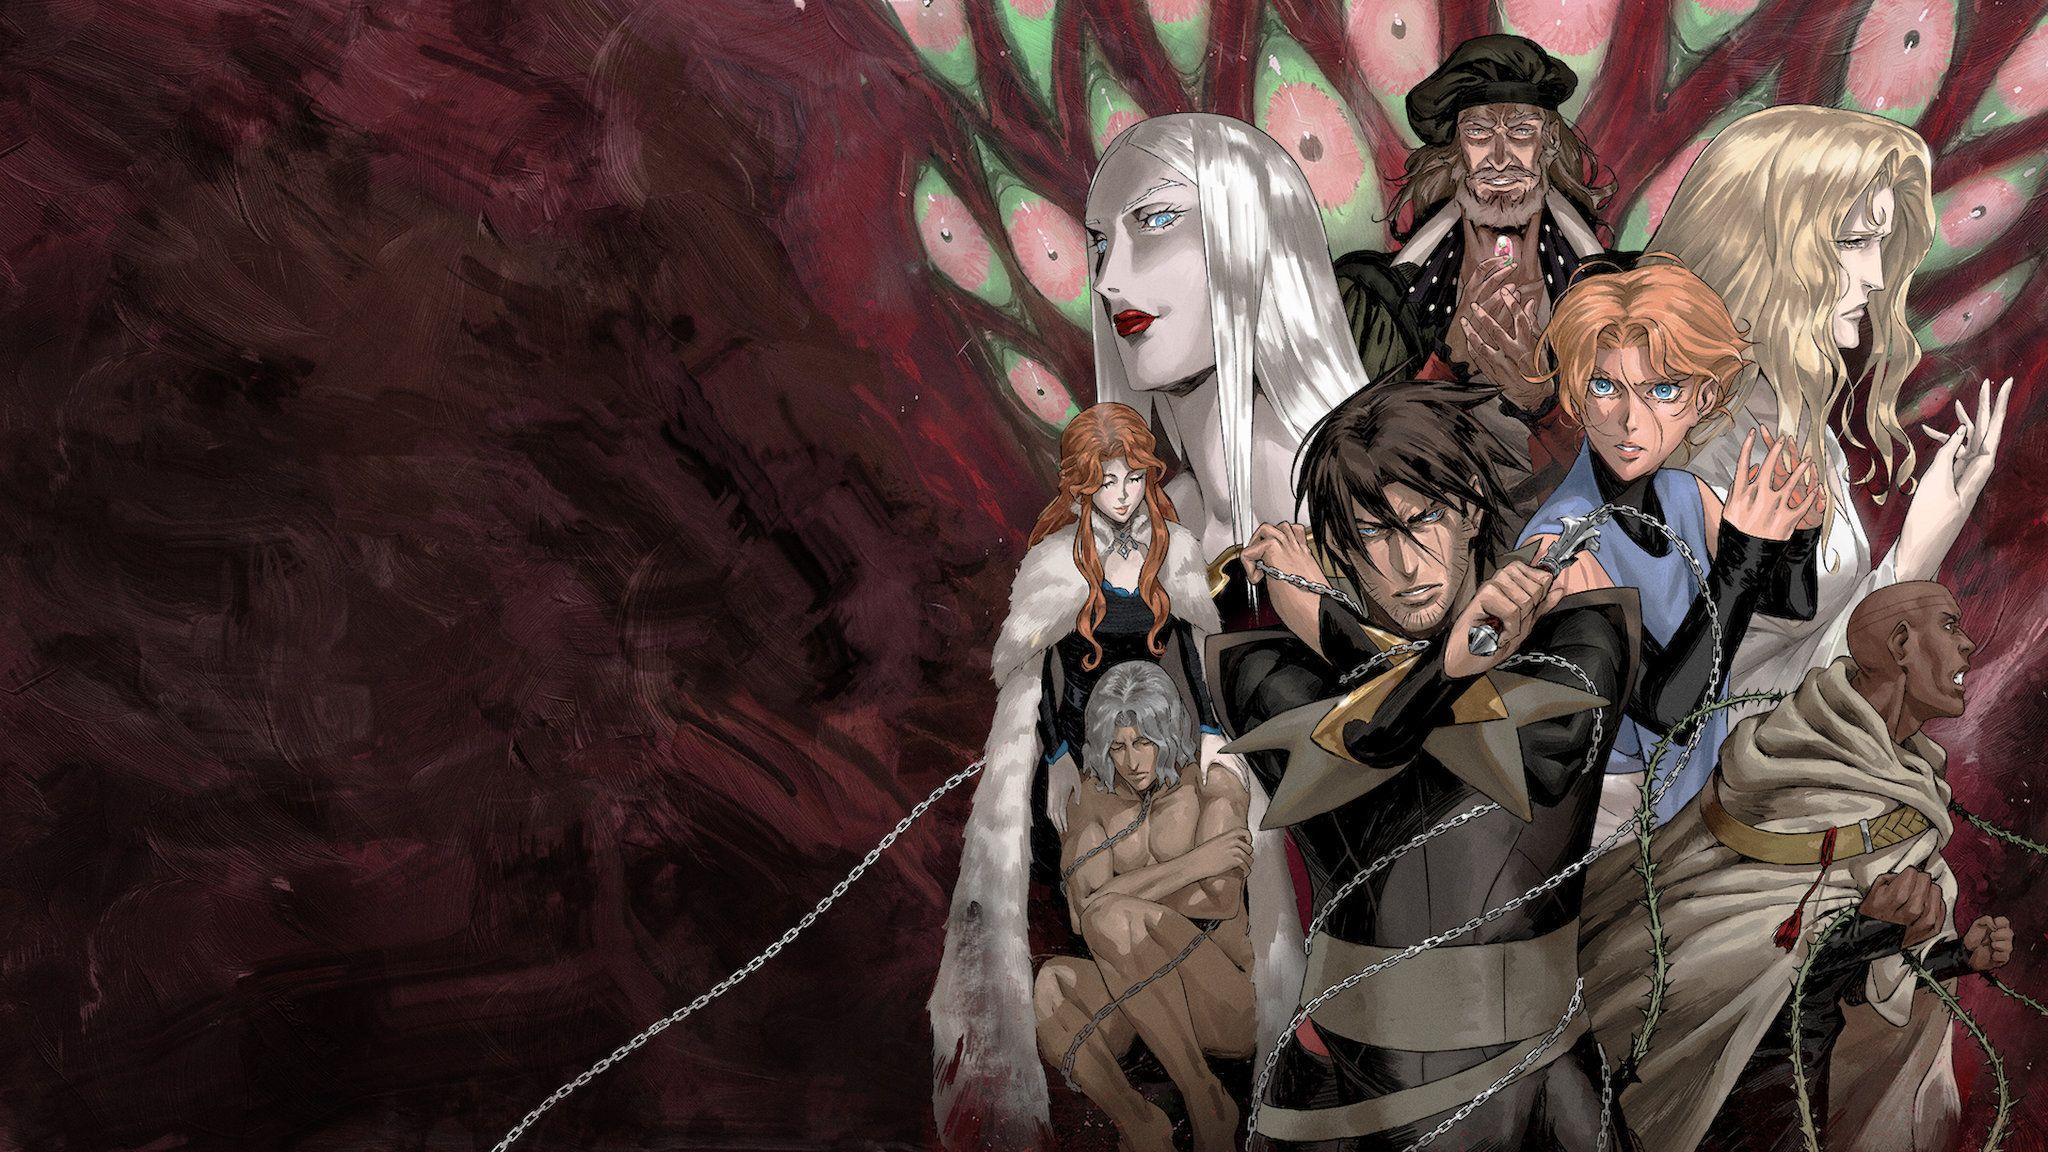 Castlevania 3 in 2020 Castlevania 3, Princess zelda